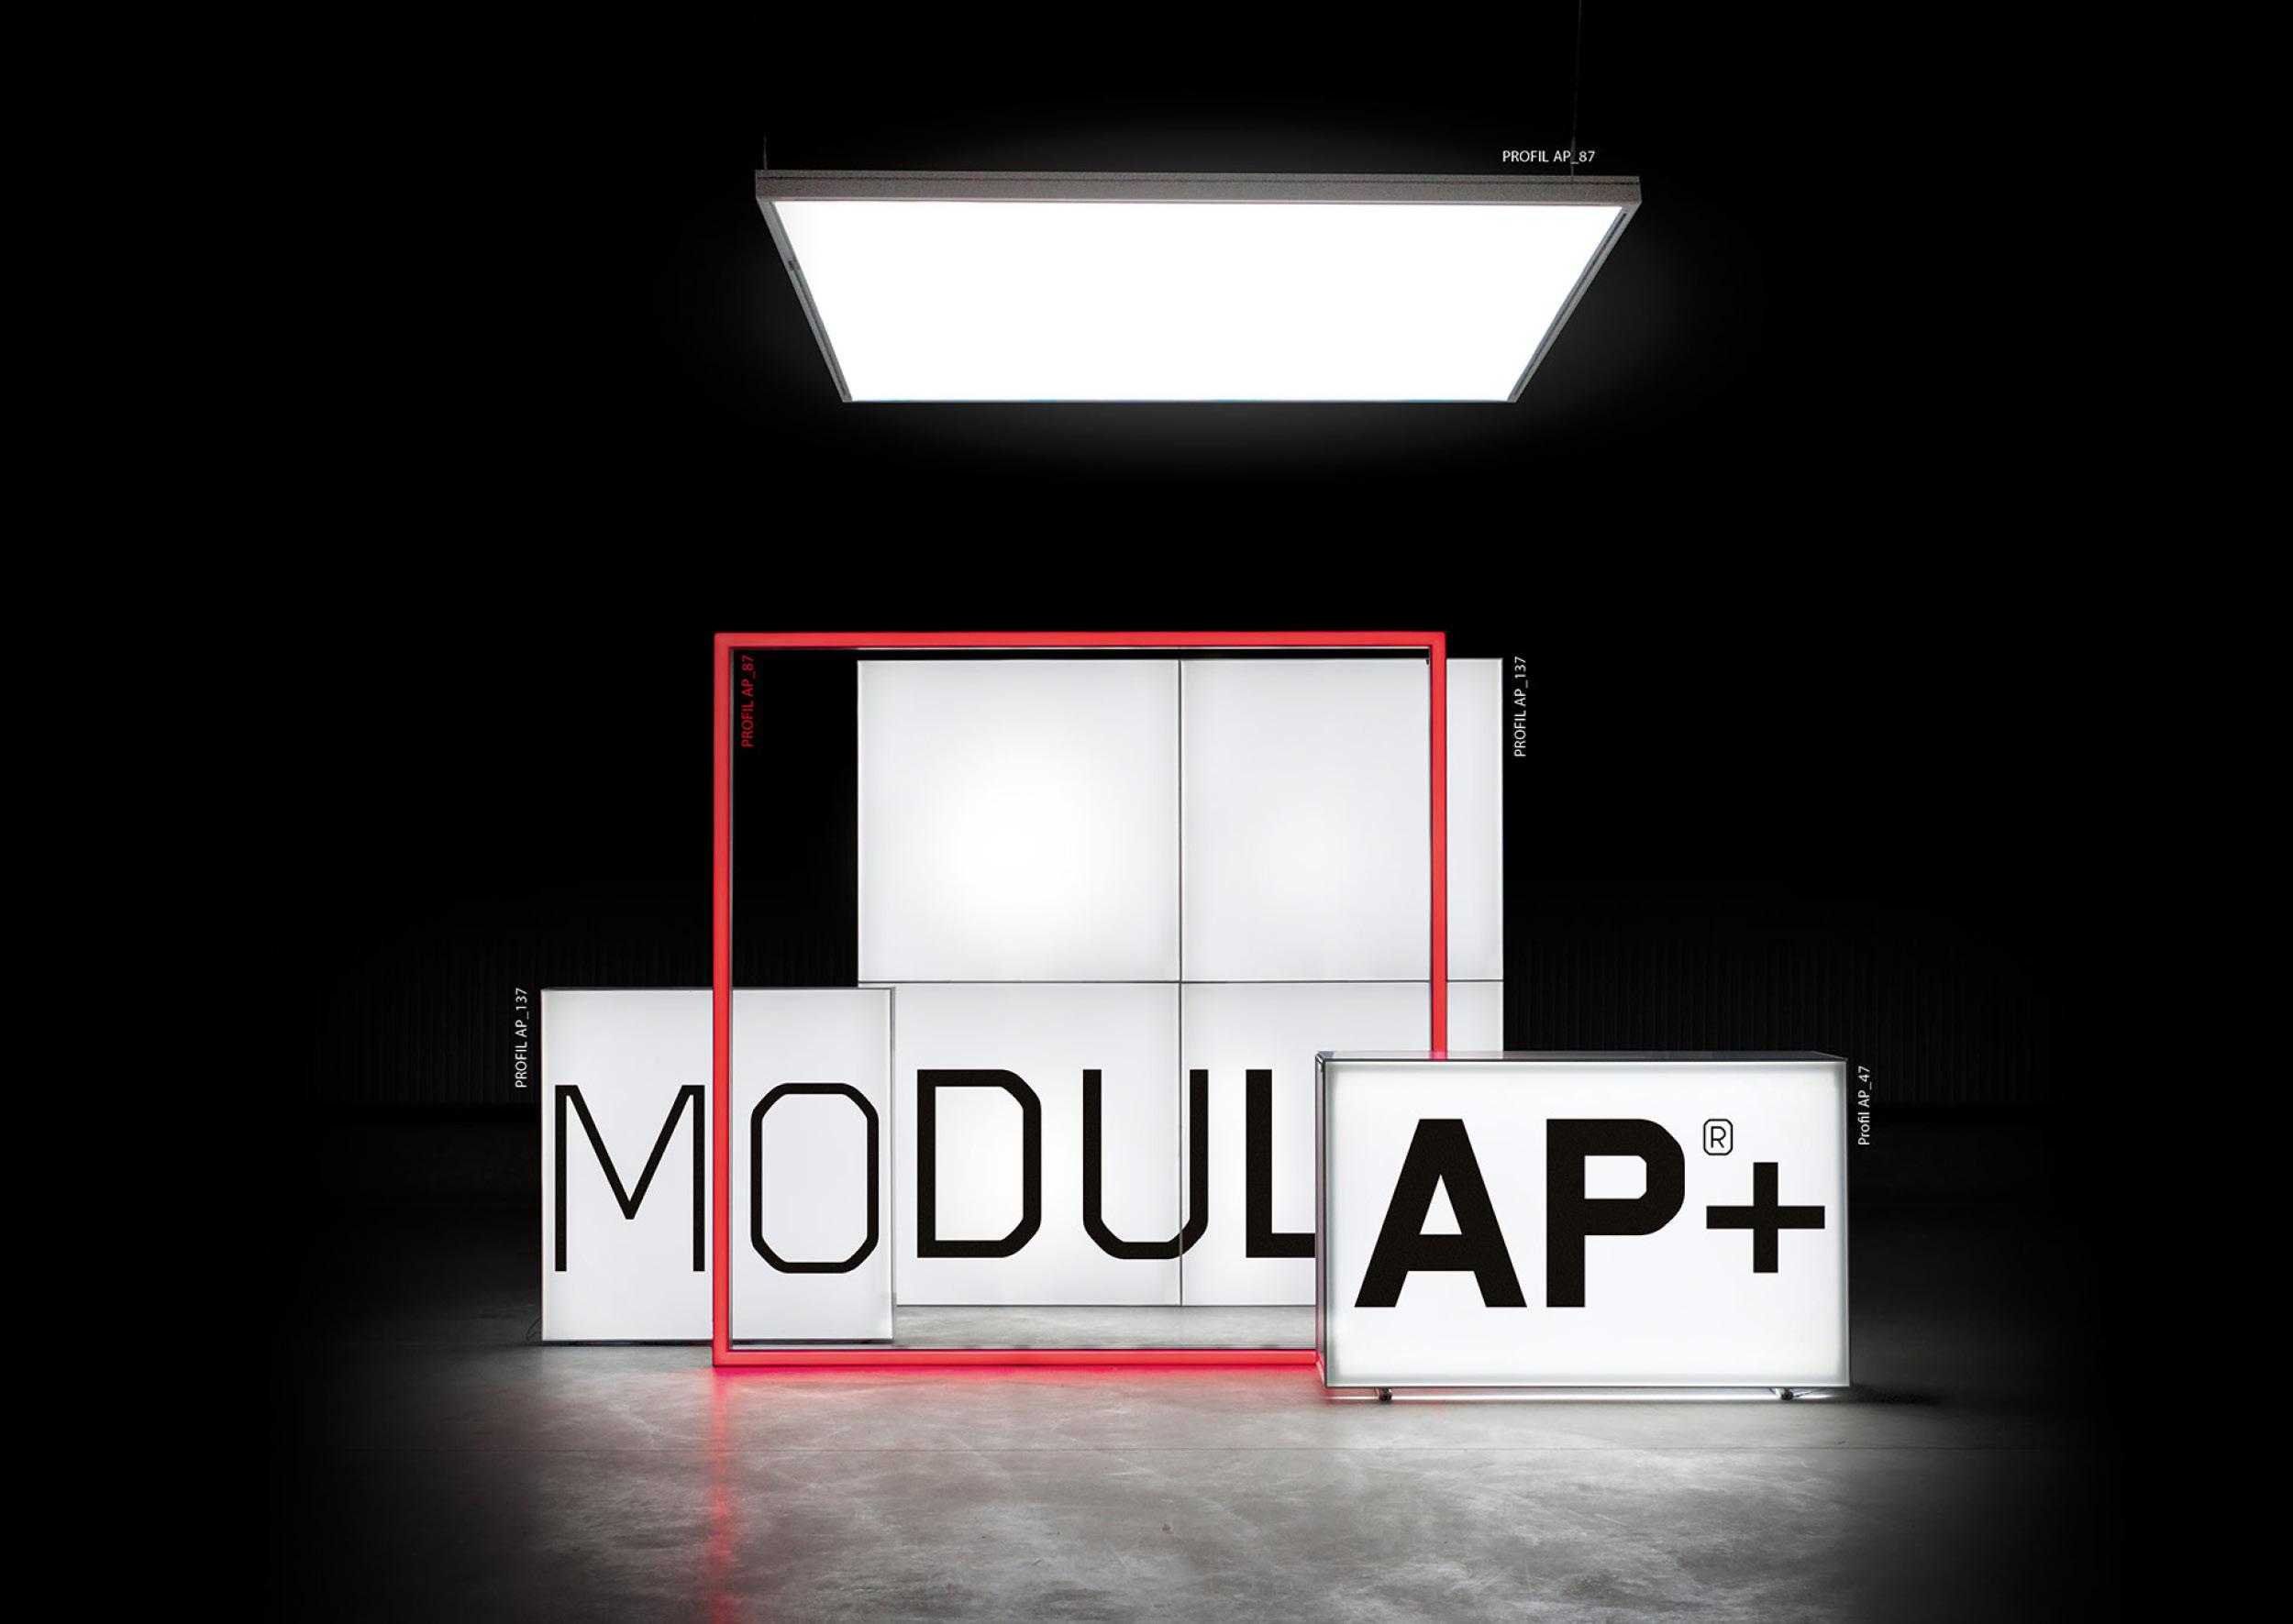 Nikolas-Wrobel-12x85-Modulap-Brand-Identity-Logo__2